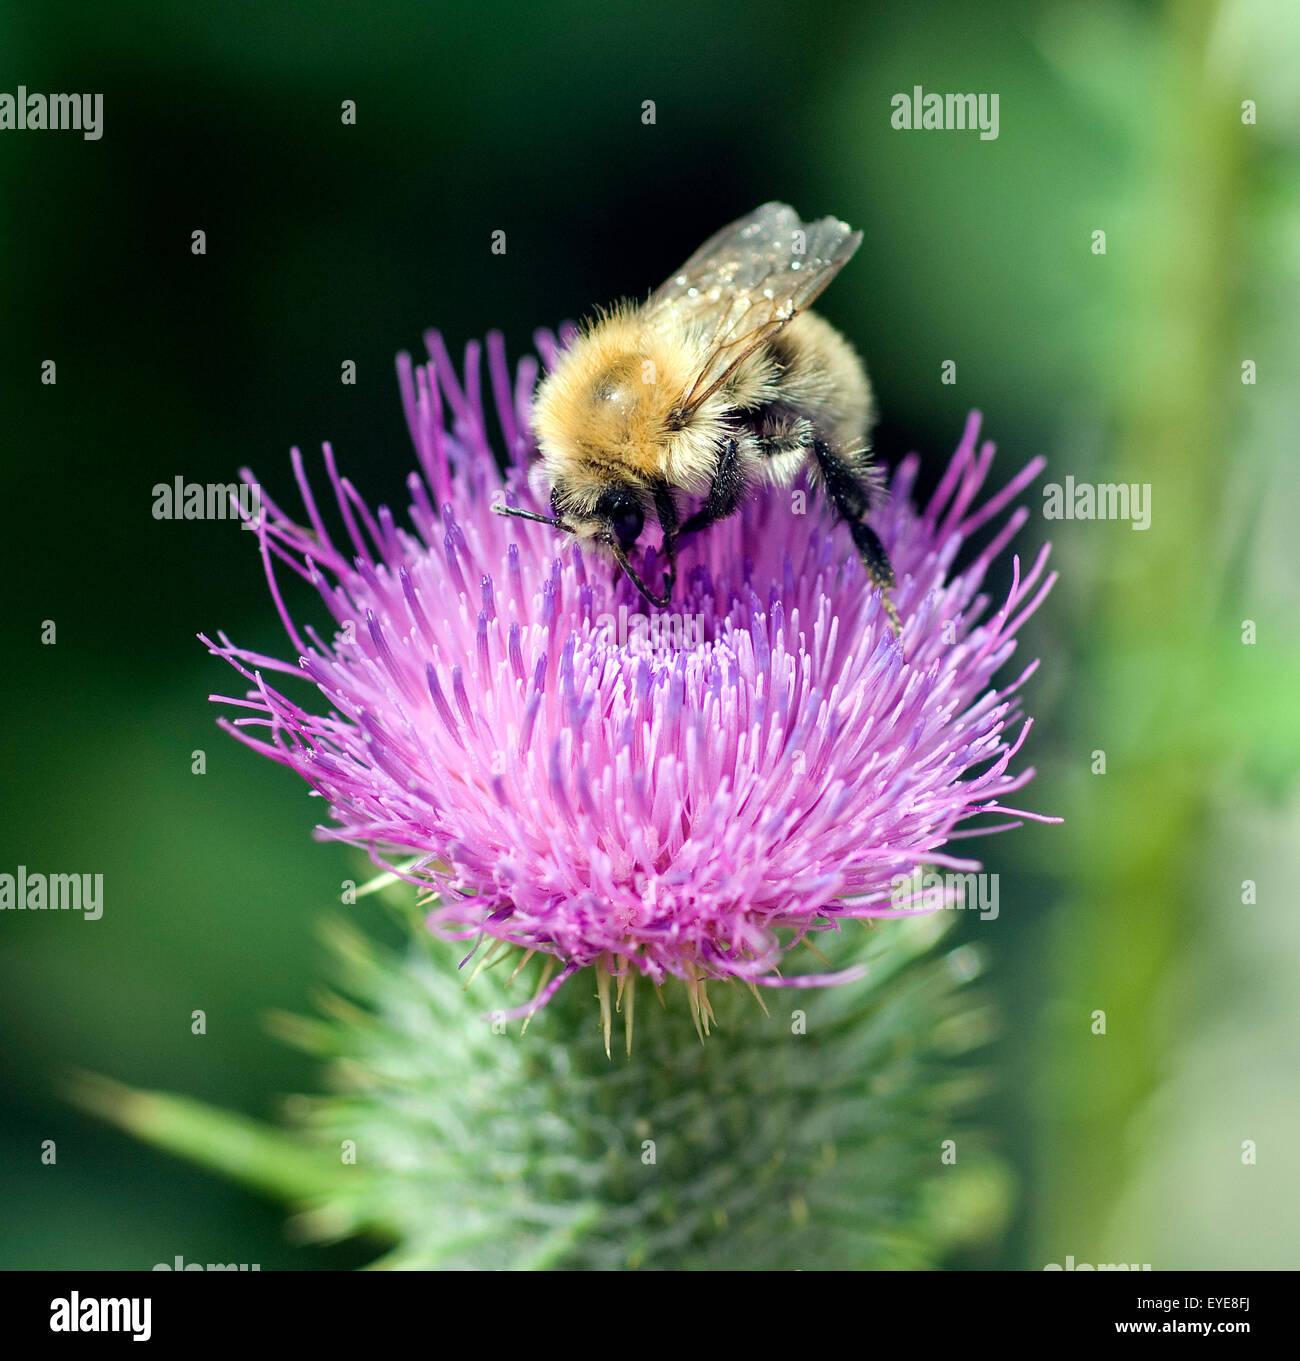 Kratzdistel; Ackerhummel; Bombus pascuorum; Hummel; - Stock Image